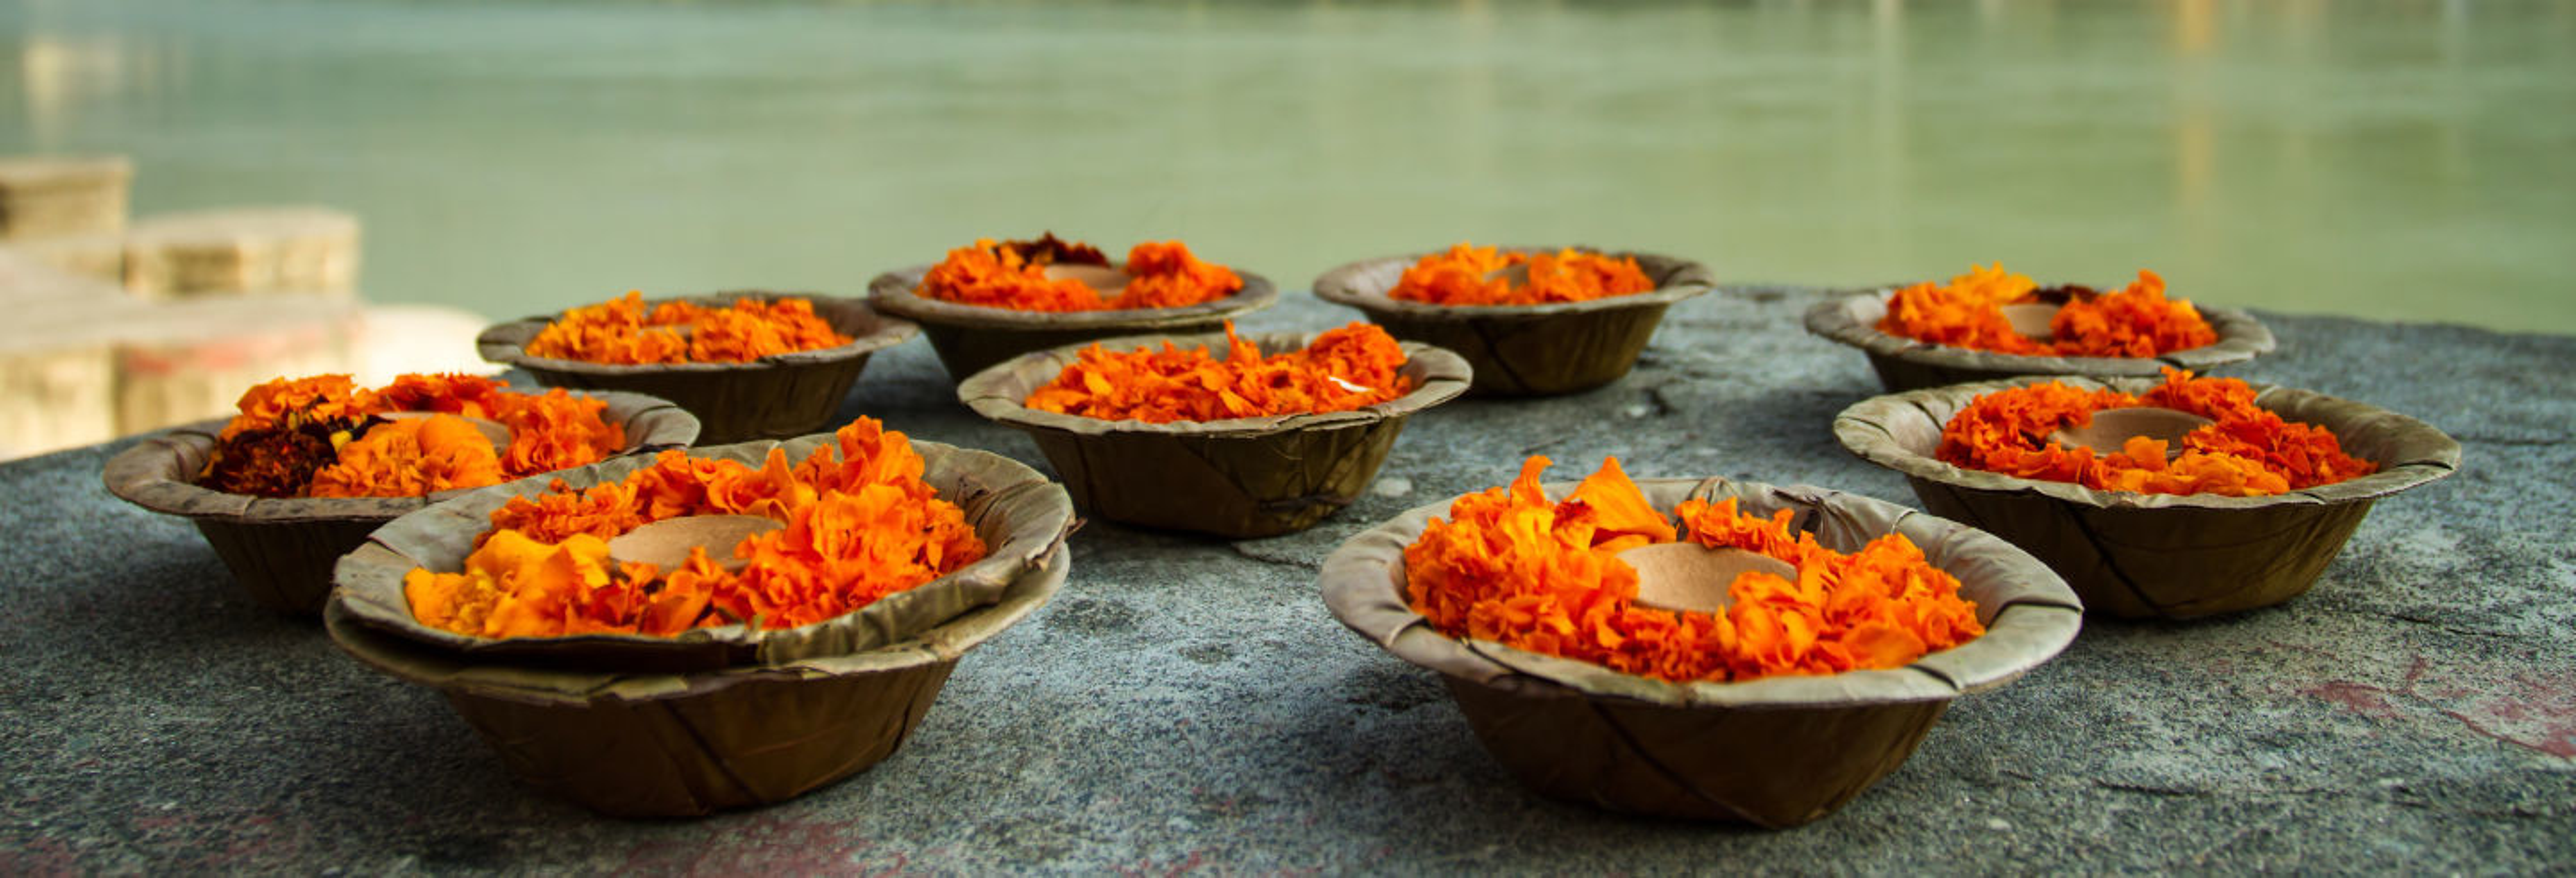 Visite spirituelle + Cérémonie Aarti